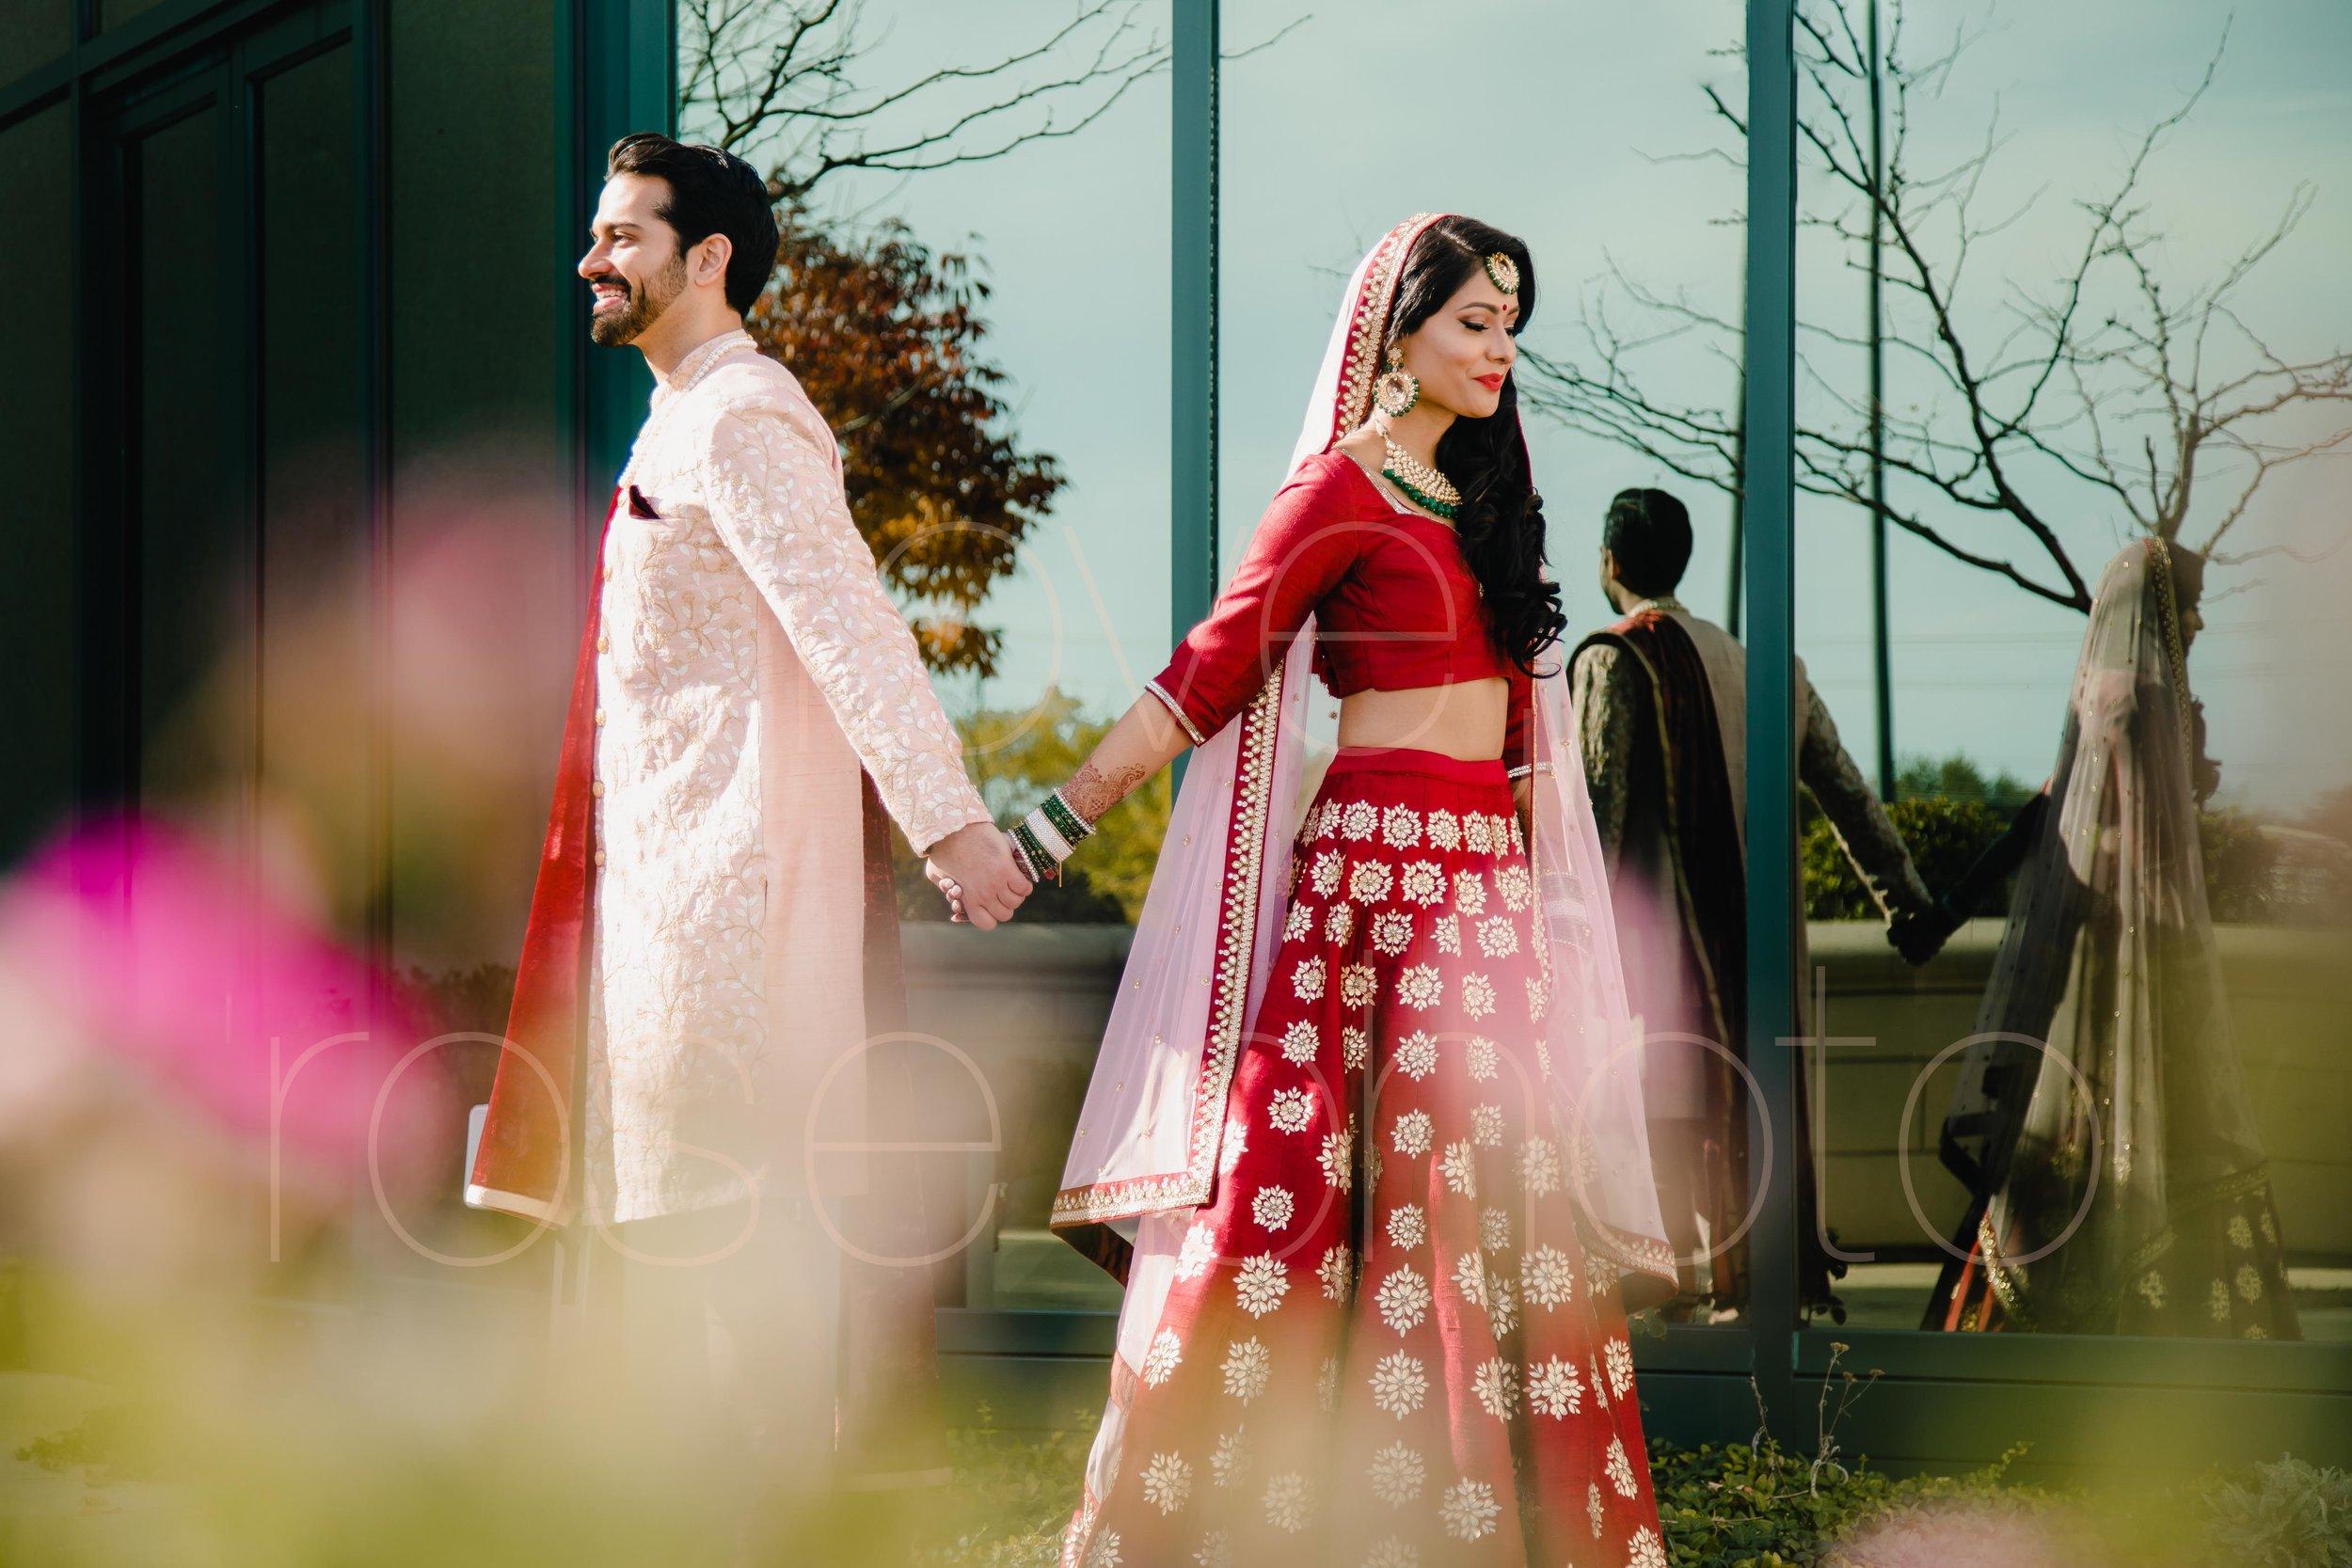 Chicago Indian Wedding best photography lifestyle wedding portrait luxury wedding-10.jpg